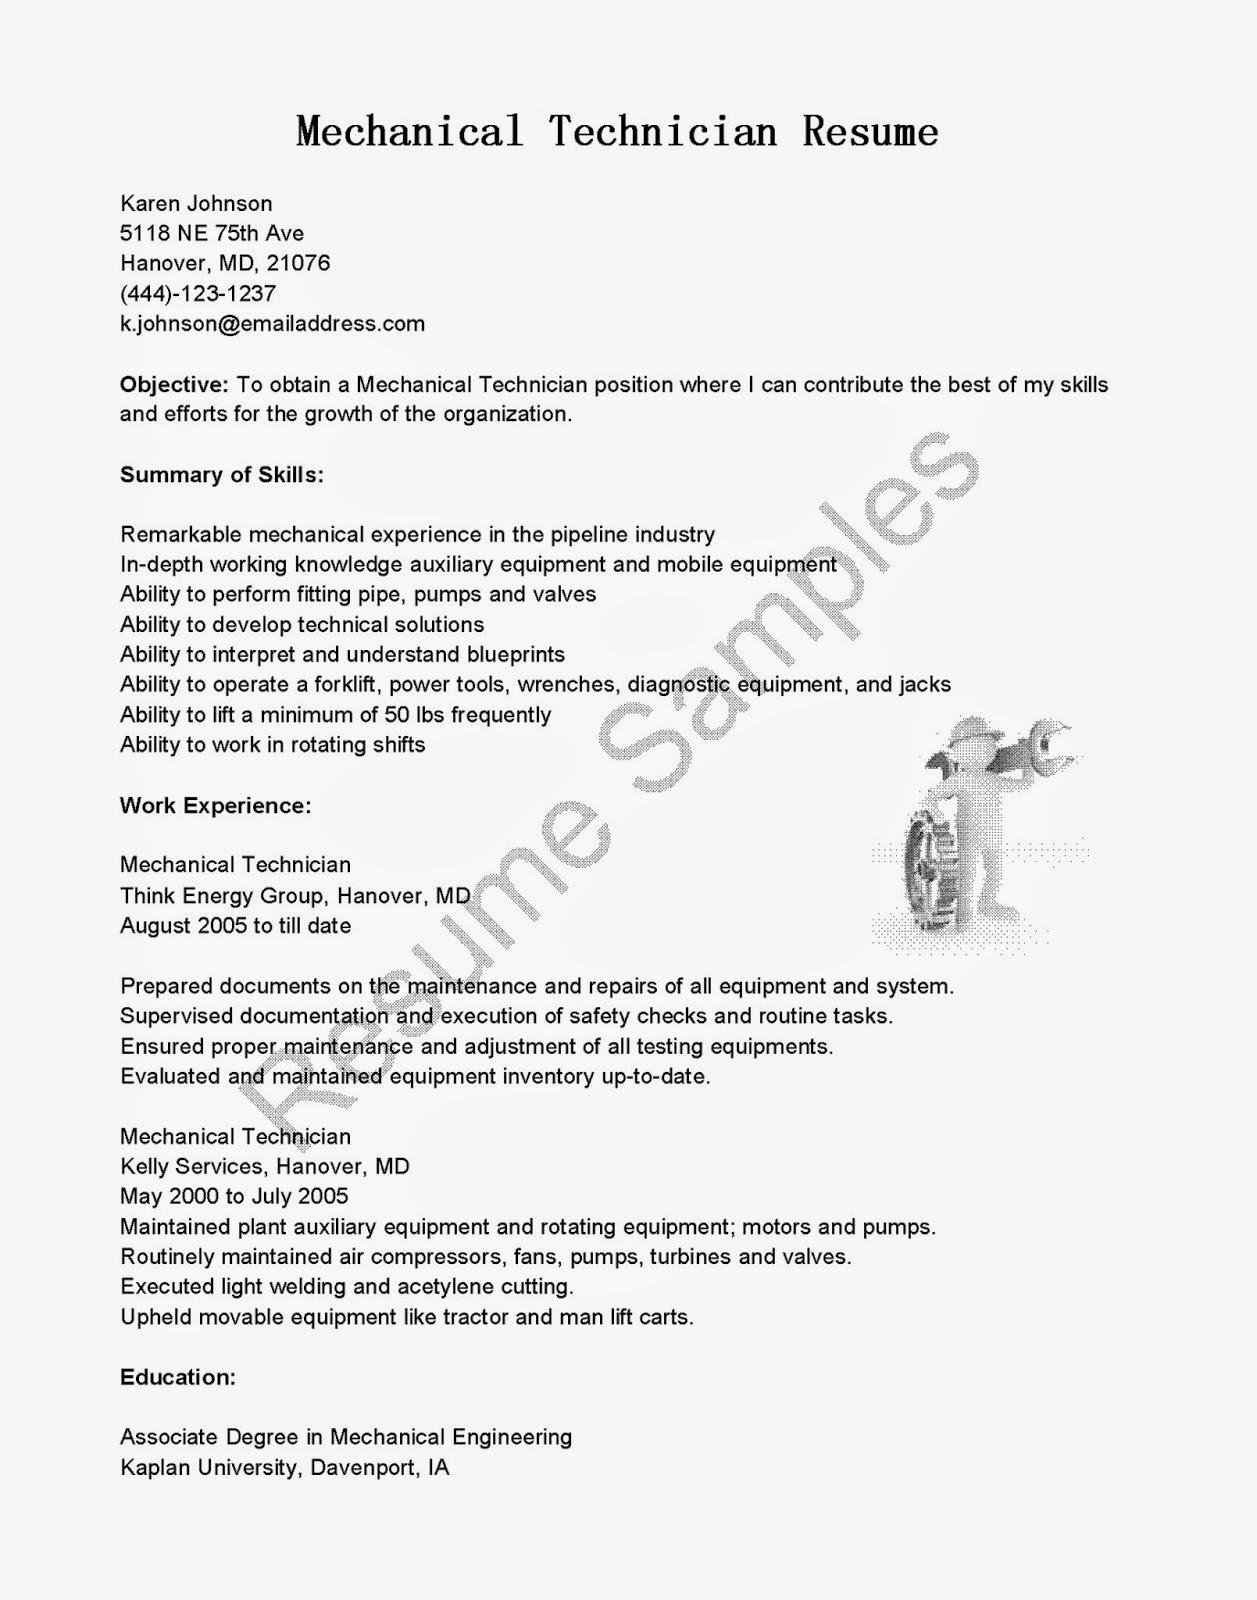 maintenance sample resume sample customer service resume maintenance sample resume retail store manager sample resume example resume samples mechanical technician resume sample